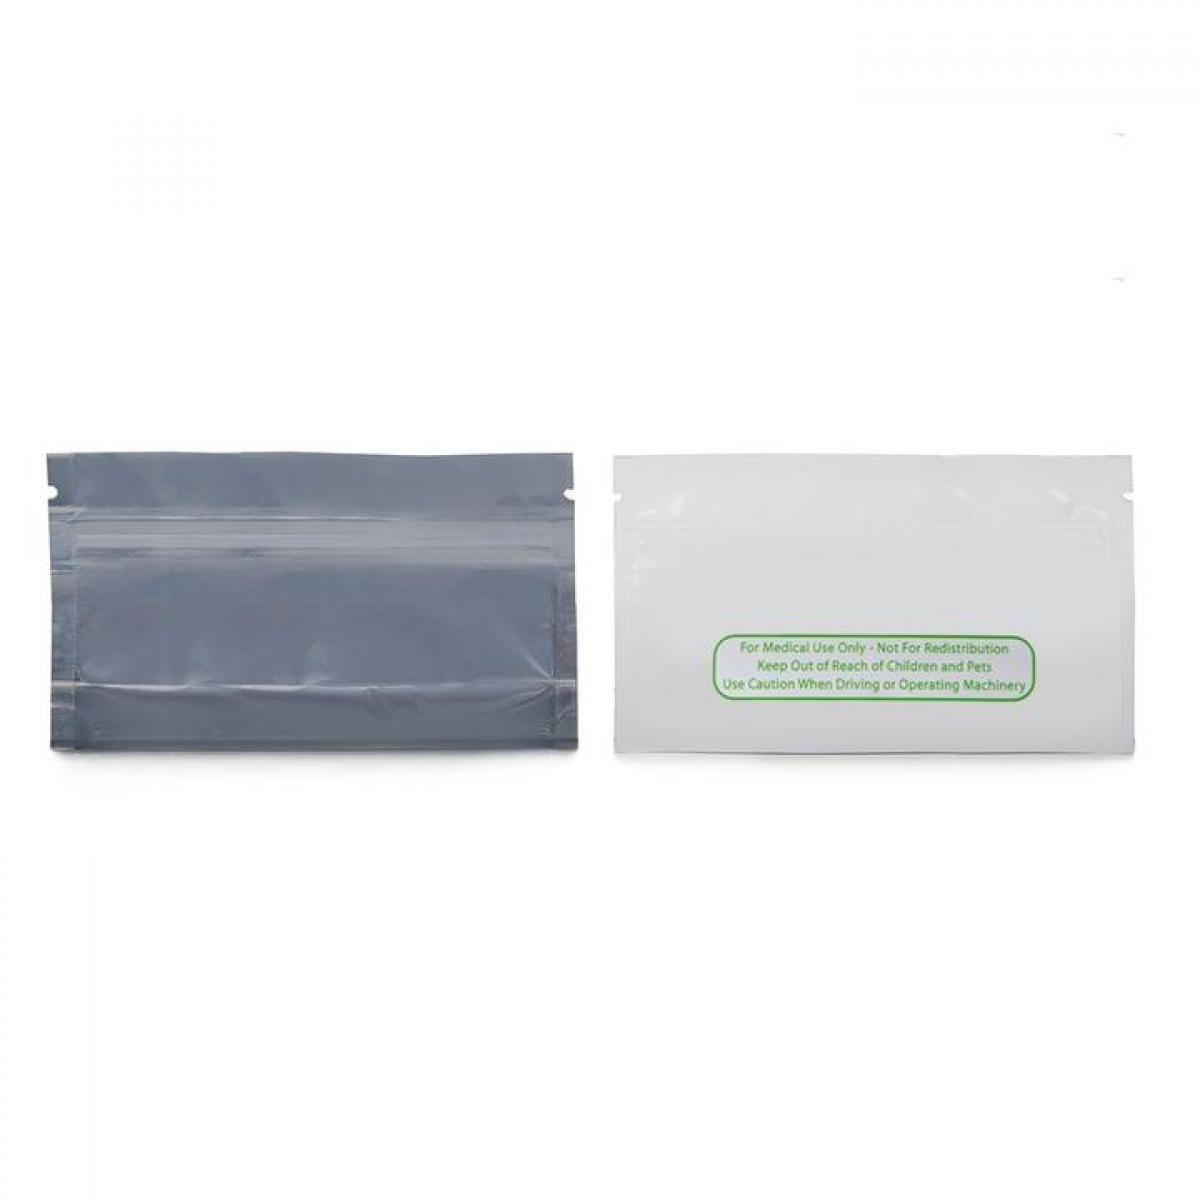 1000x Mylar Bags (Pre-Roll Size) Loud Lock Compliant Quality